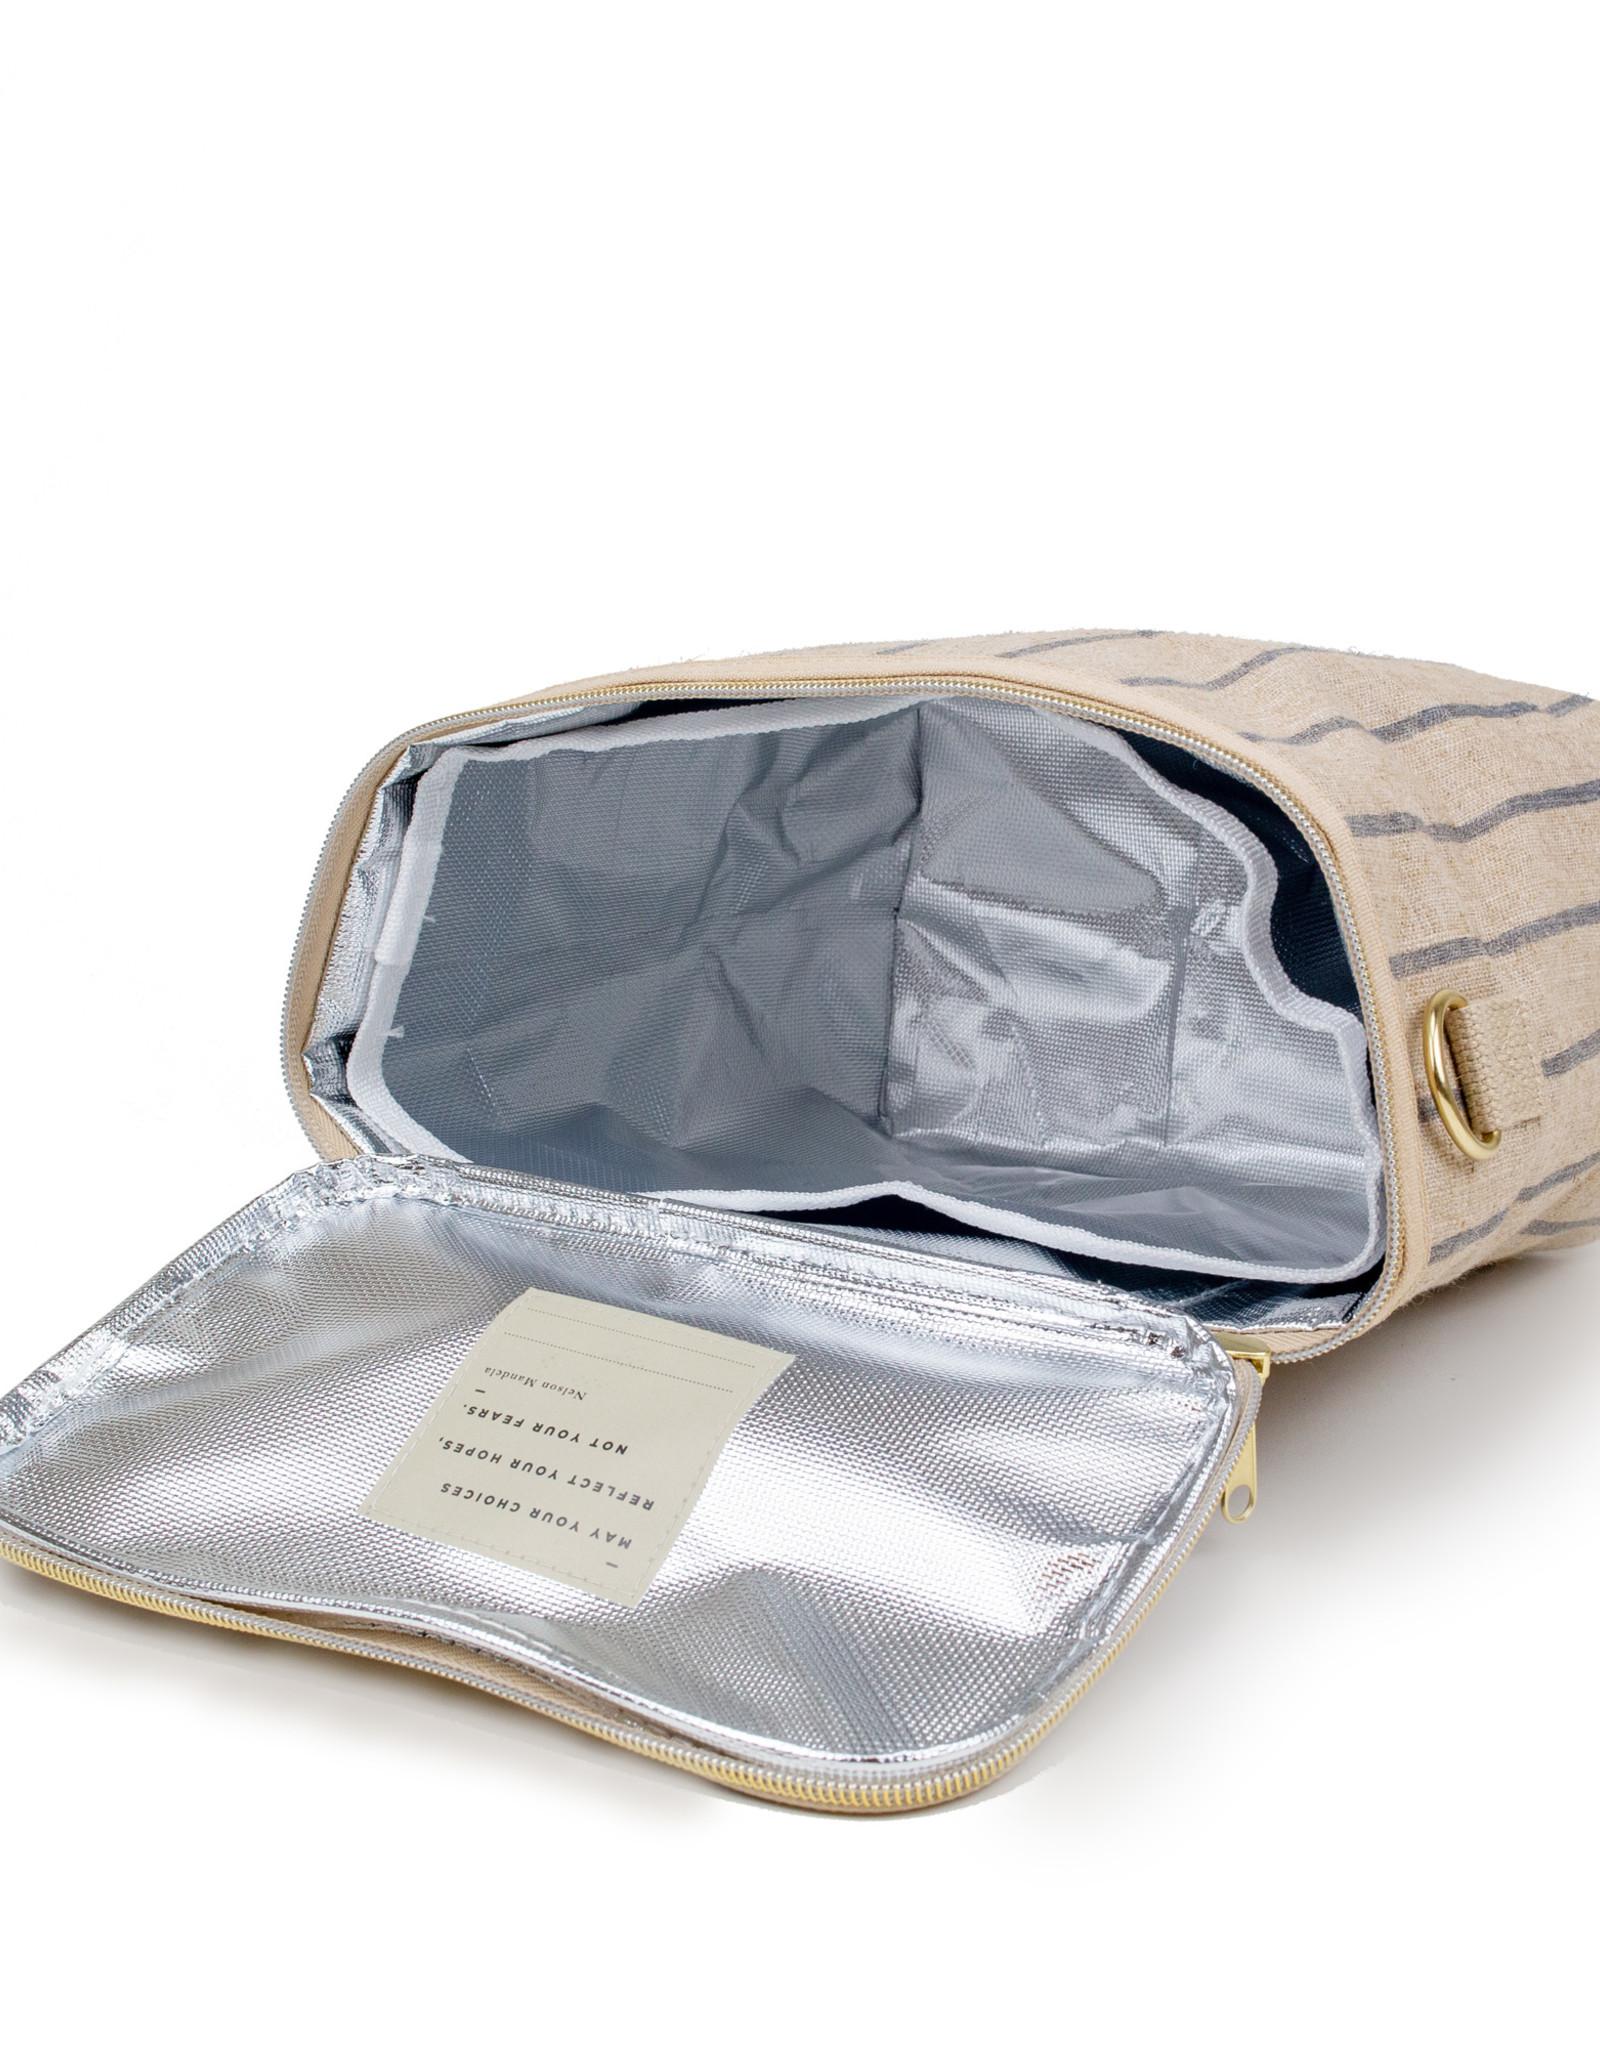 Boîte à lunch à rayures verticales gris-bleu